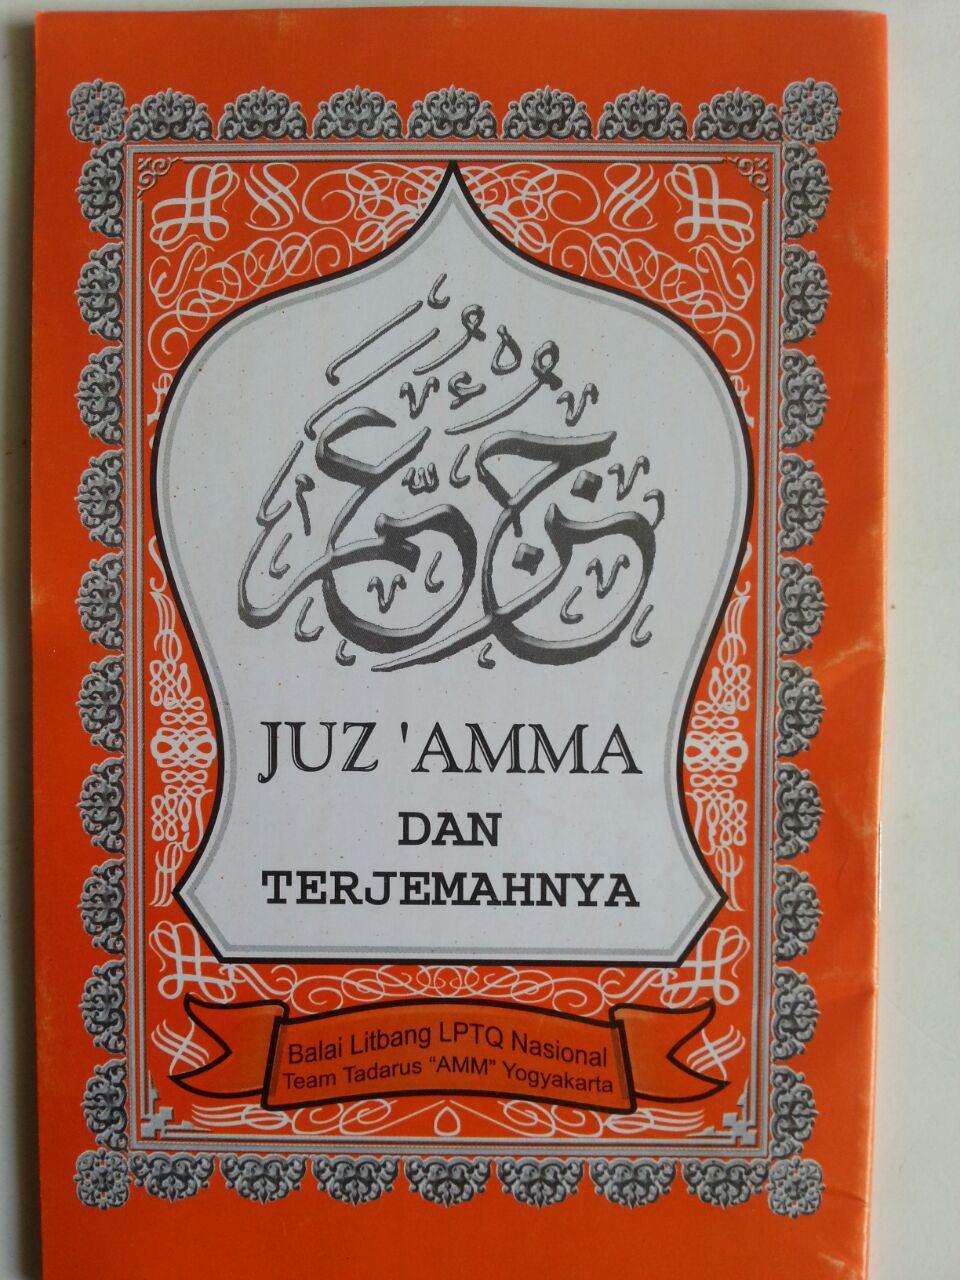 Al-Qur'an Juz Amma Dan Terjemahnya Ukuran A6 cover